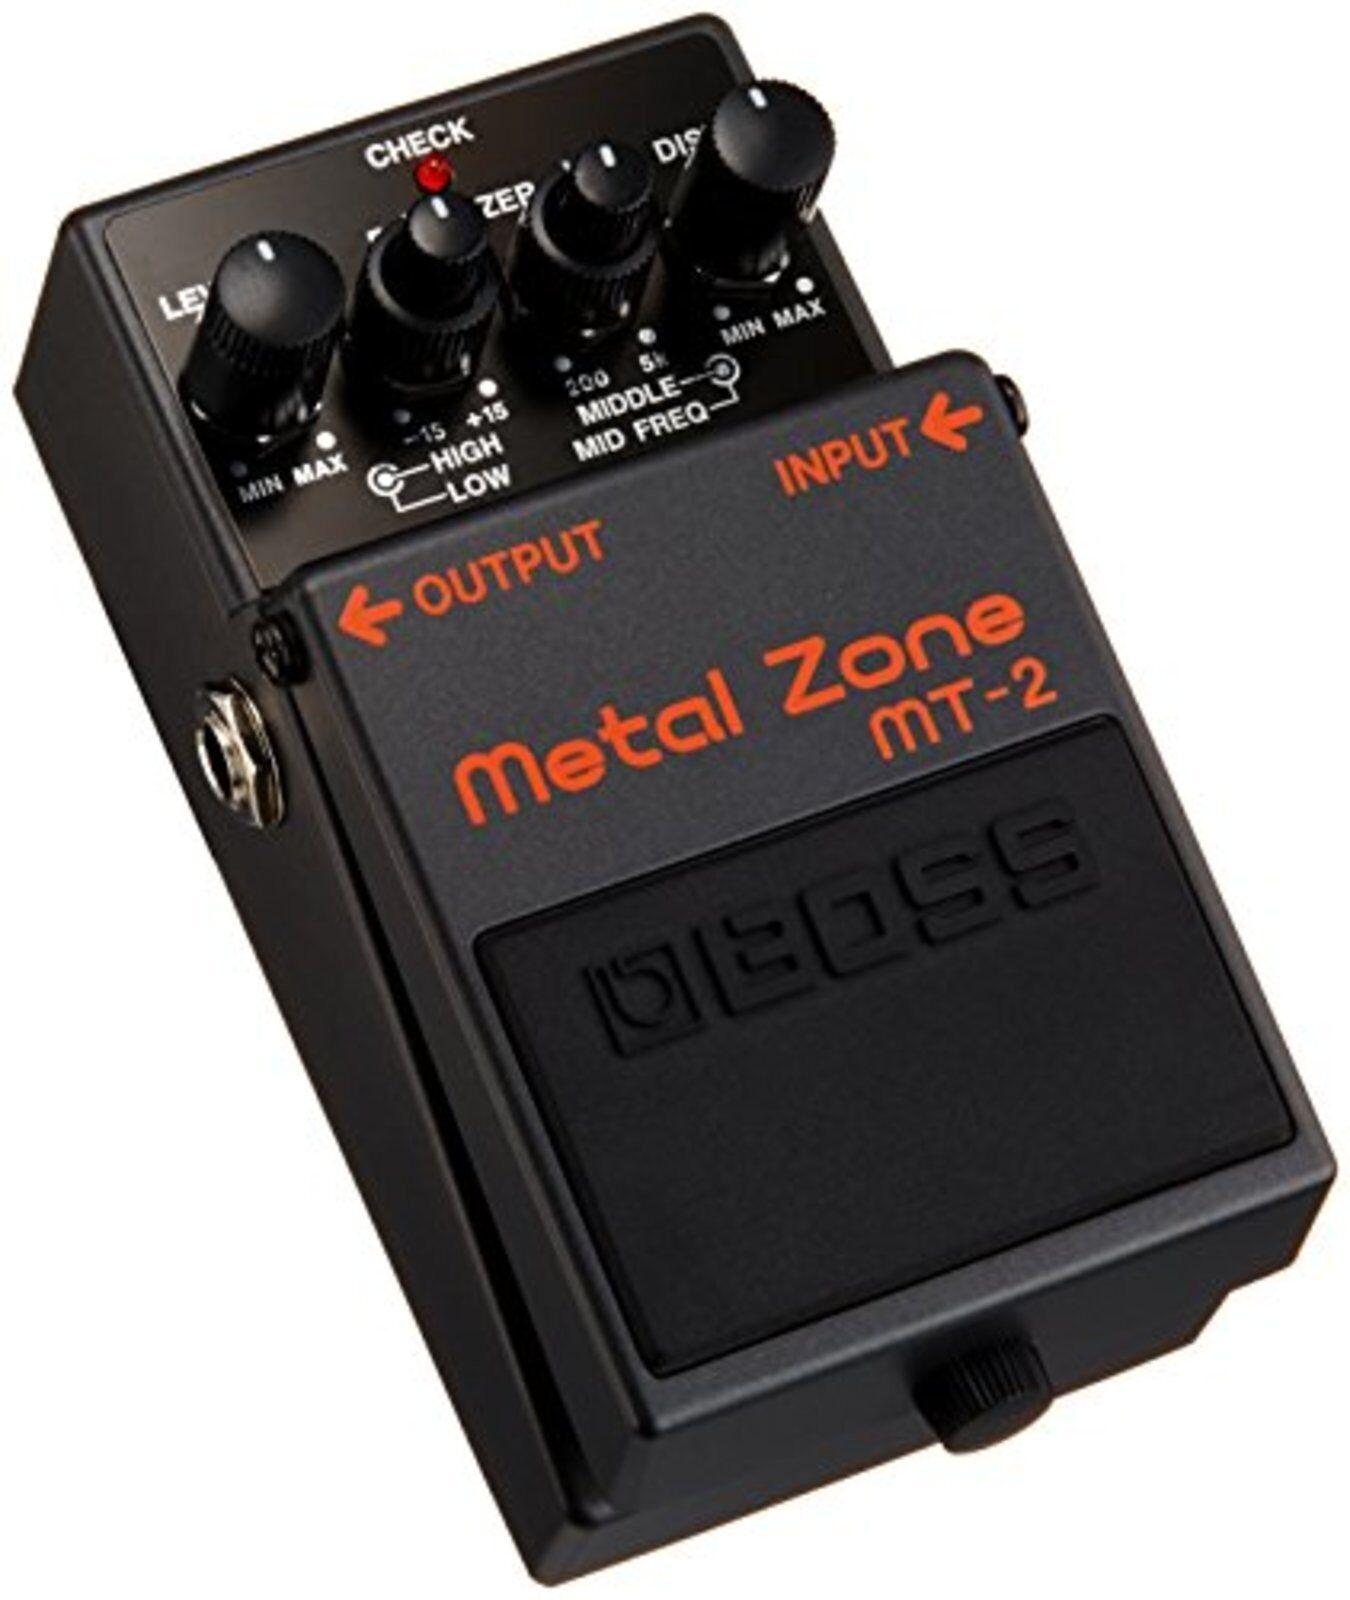 Boss Metall Zone Mt-2 Effekt Pedal mit Abtastung   Neu aus Japan